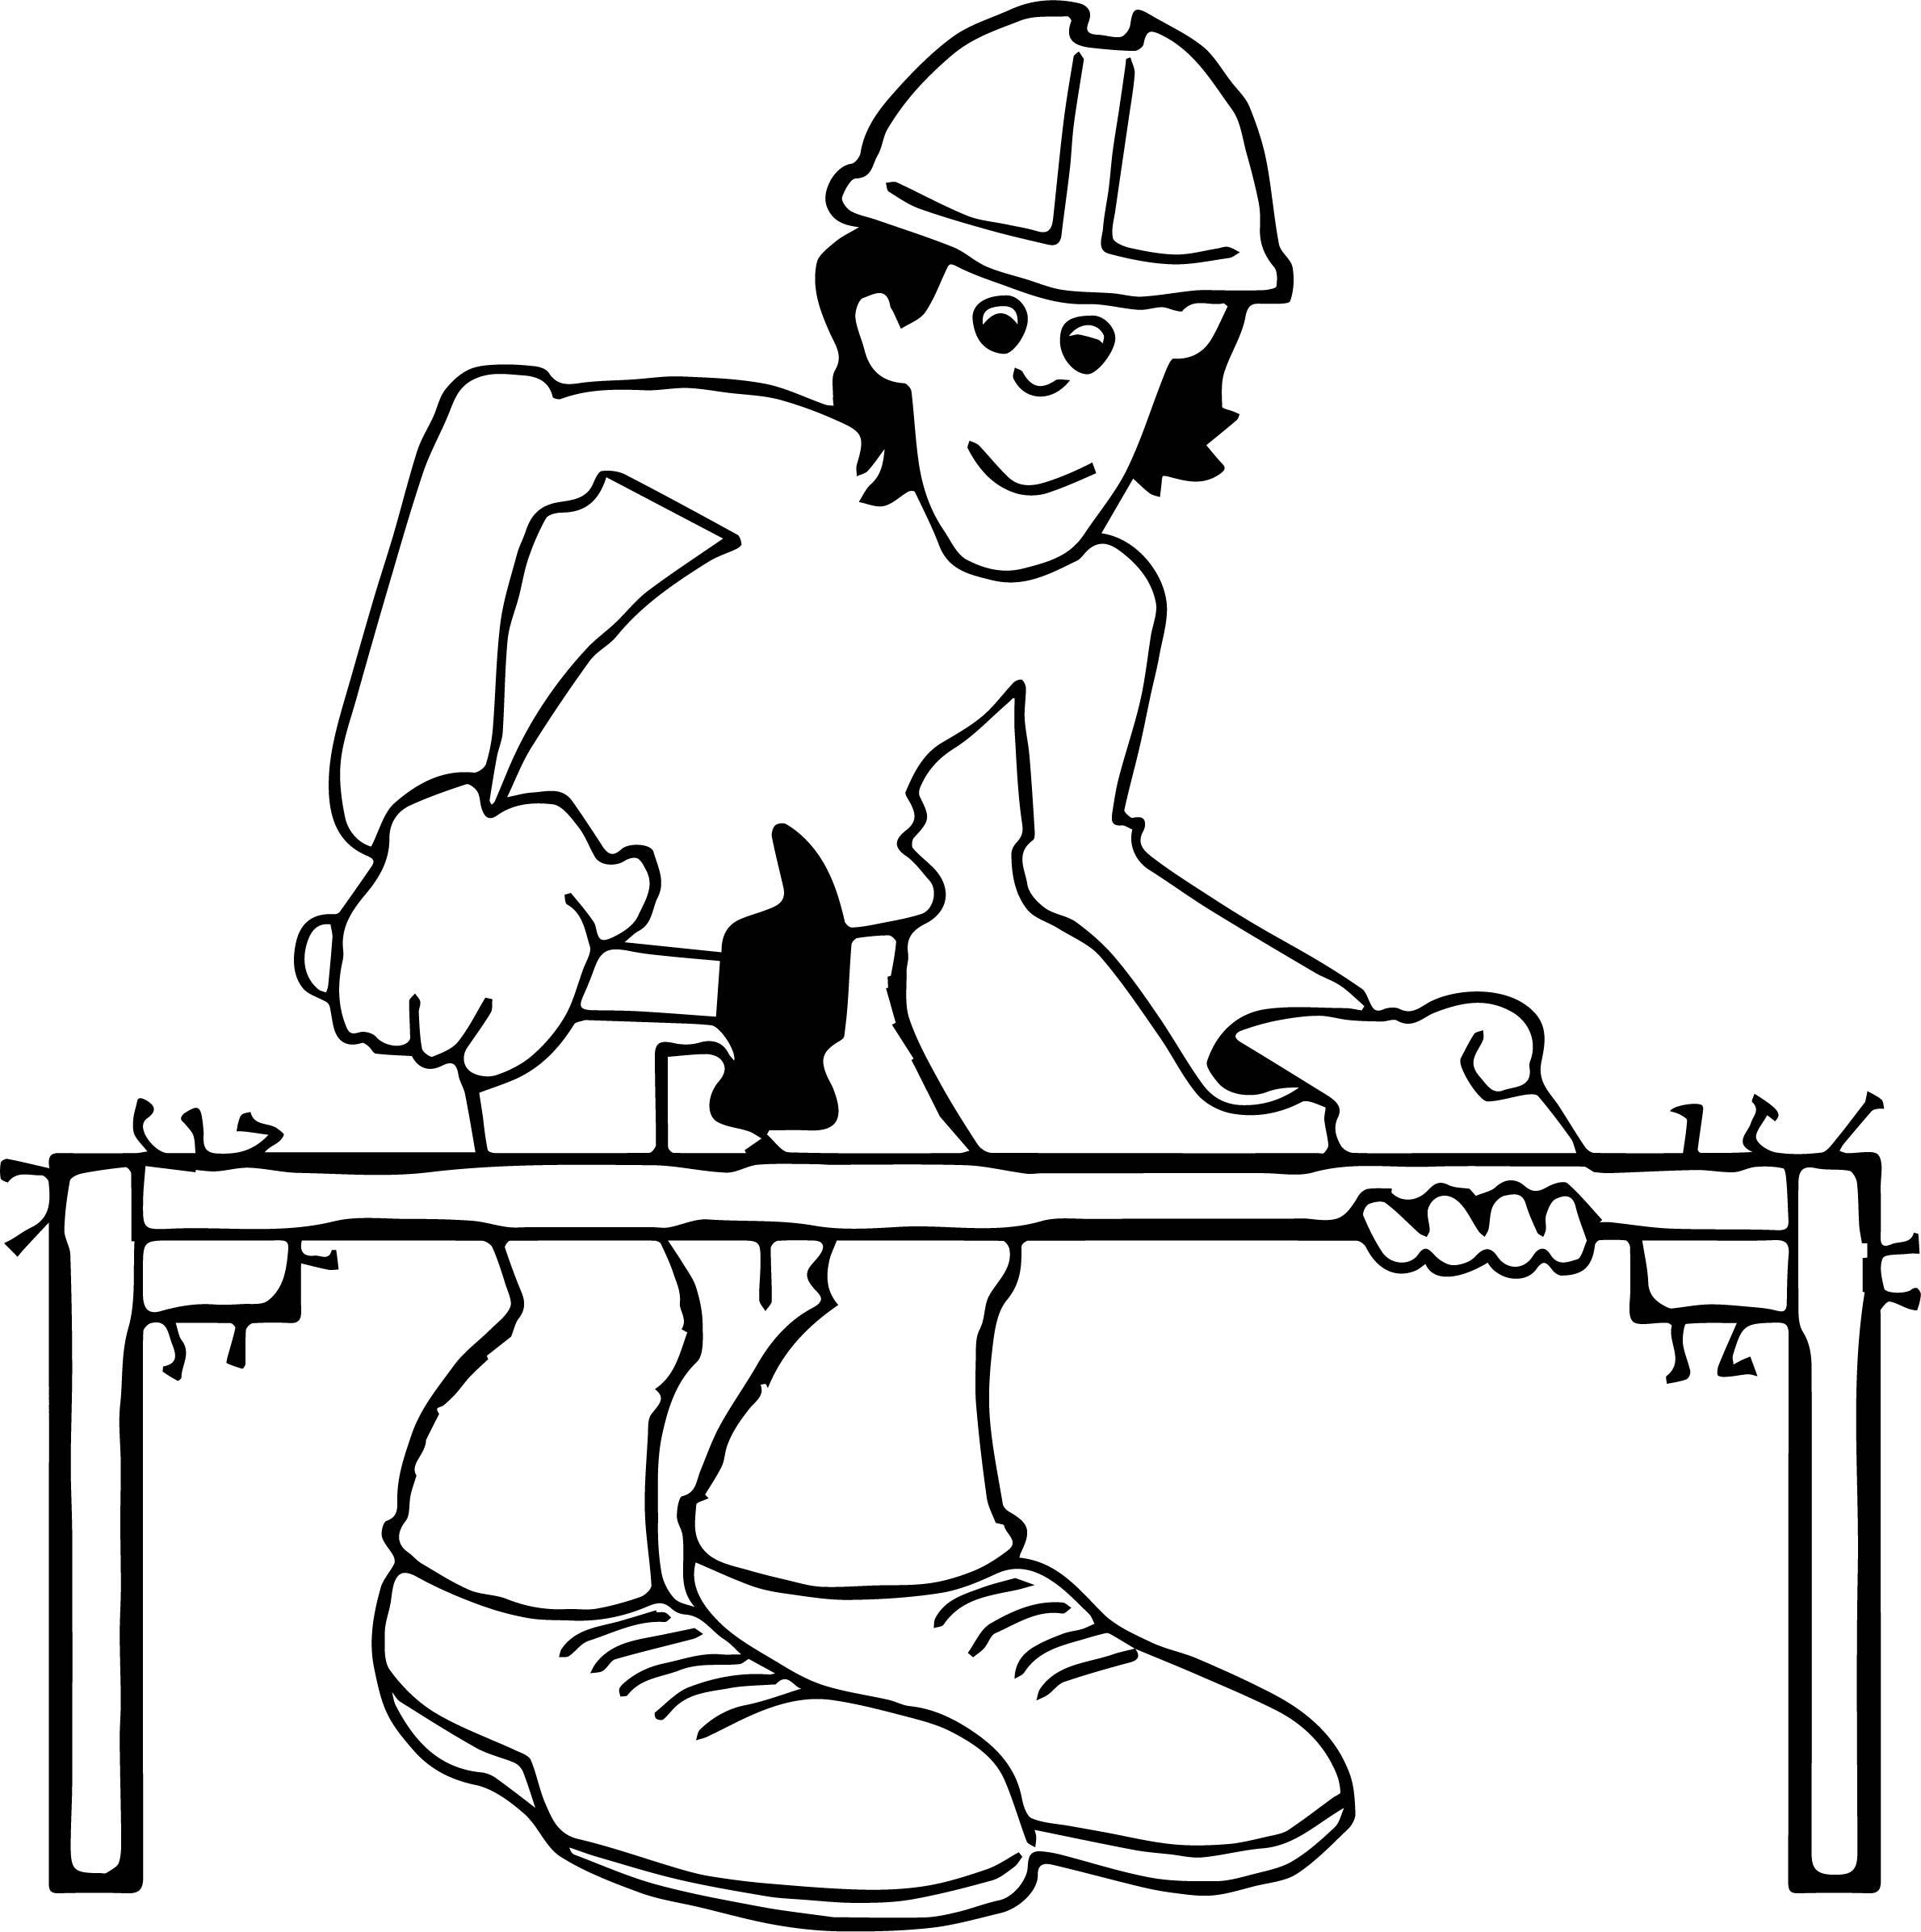 Bad Work Carpenter Coloring Page